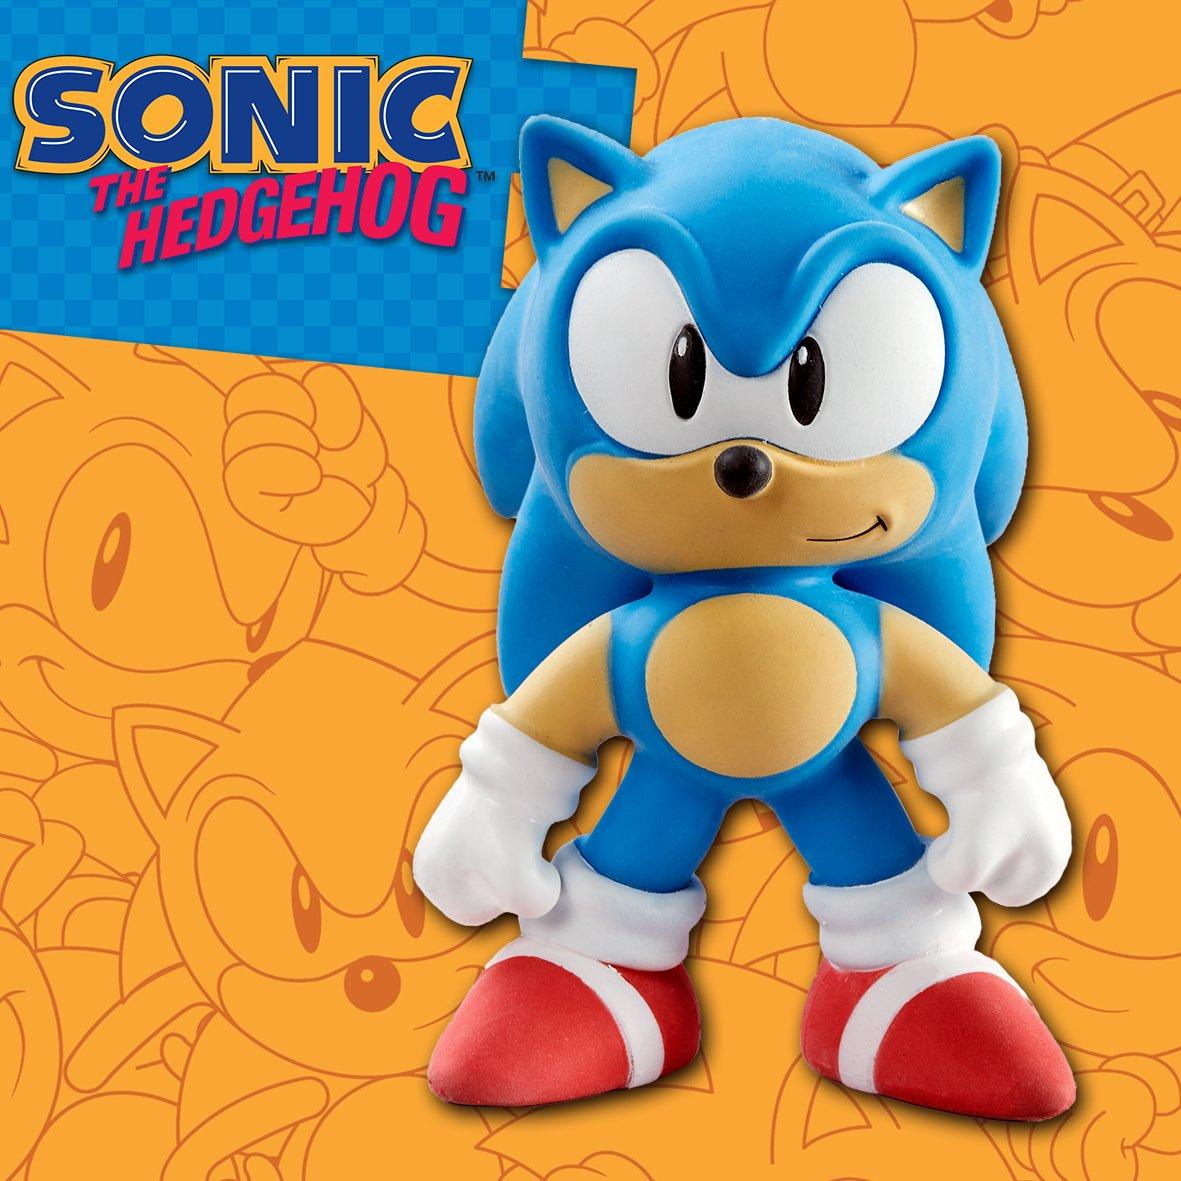 Sonic, Bandai, Bandai México, Bandai mexico, sega, sonic the hedgehog, stretch armstrong, figuras estrirables, figuras stretch armstrong, juguetes stretch armstrong, personaje retro 2019, sonic la película